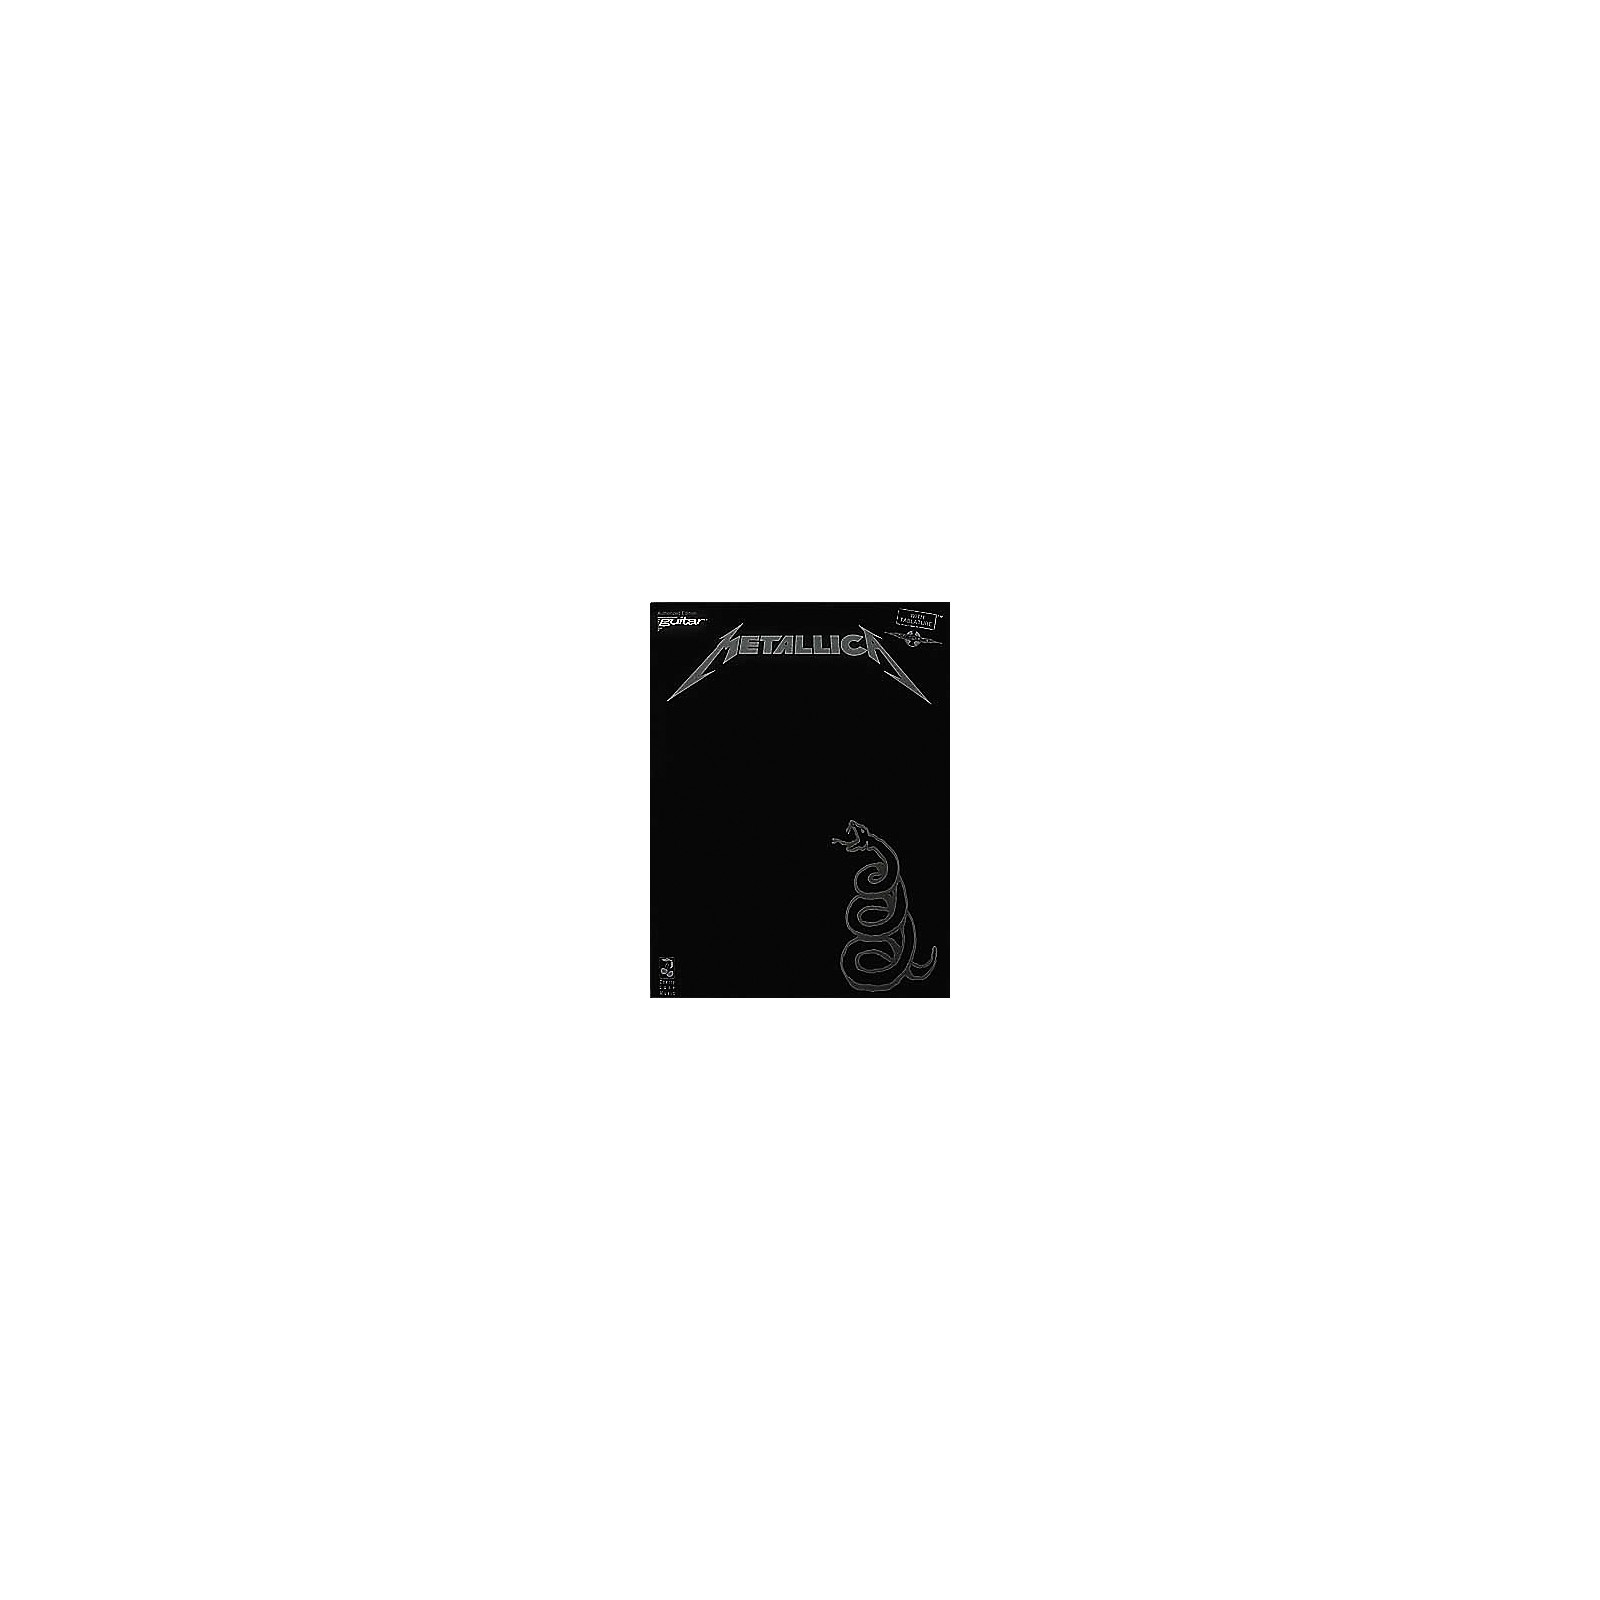 Hal Leonard Metallica The Black Album Guitar Tab Songbook